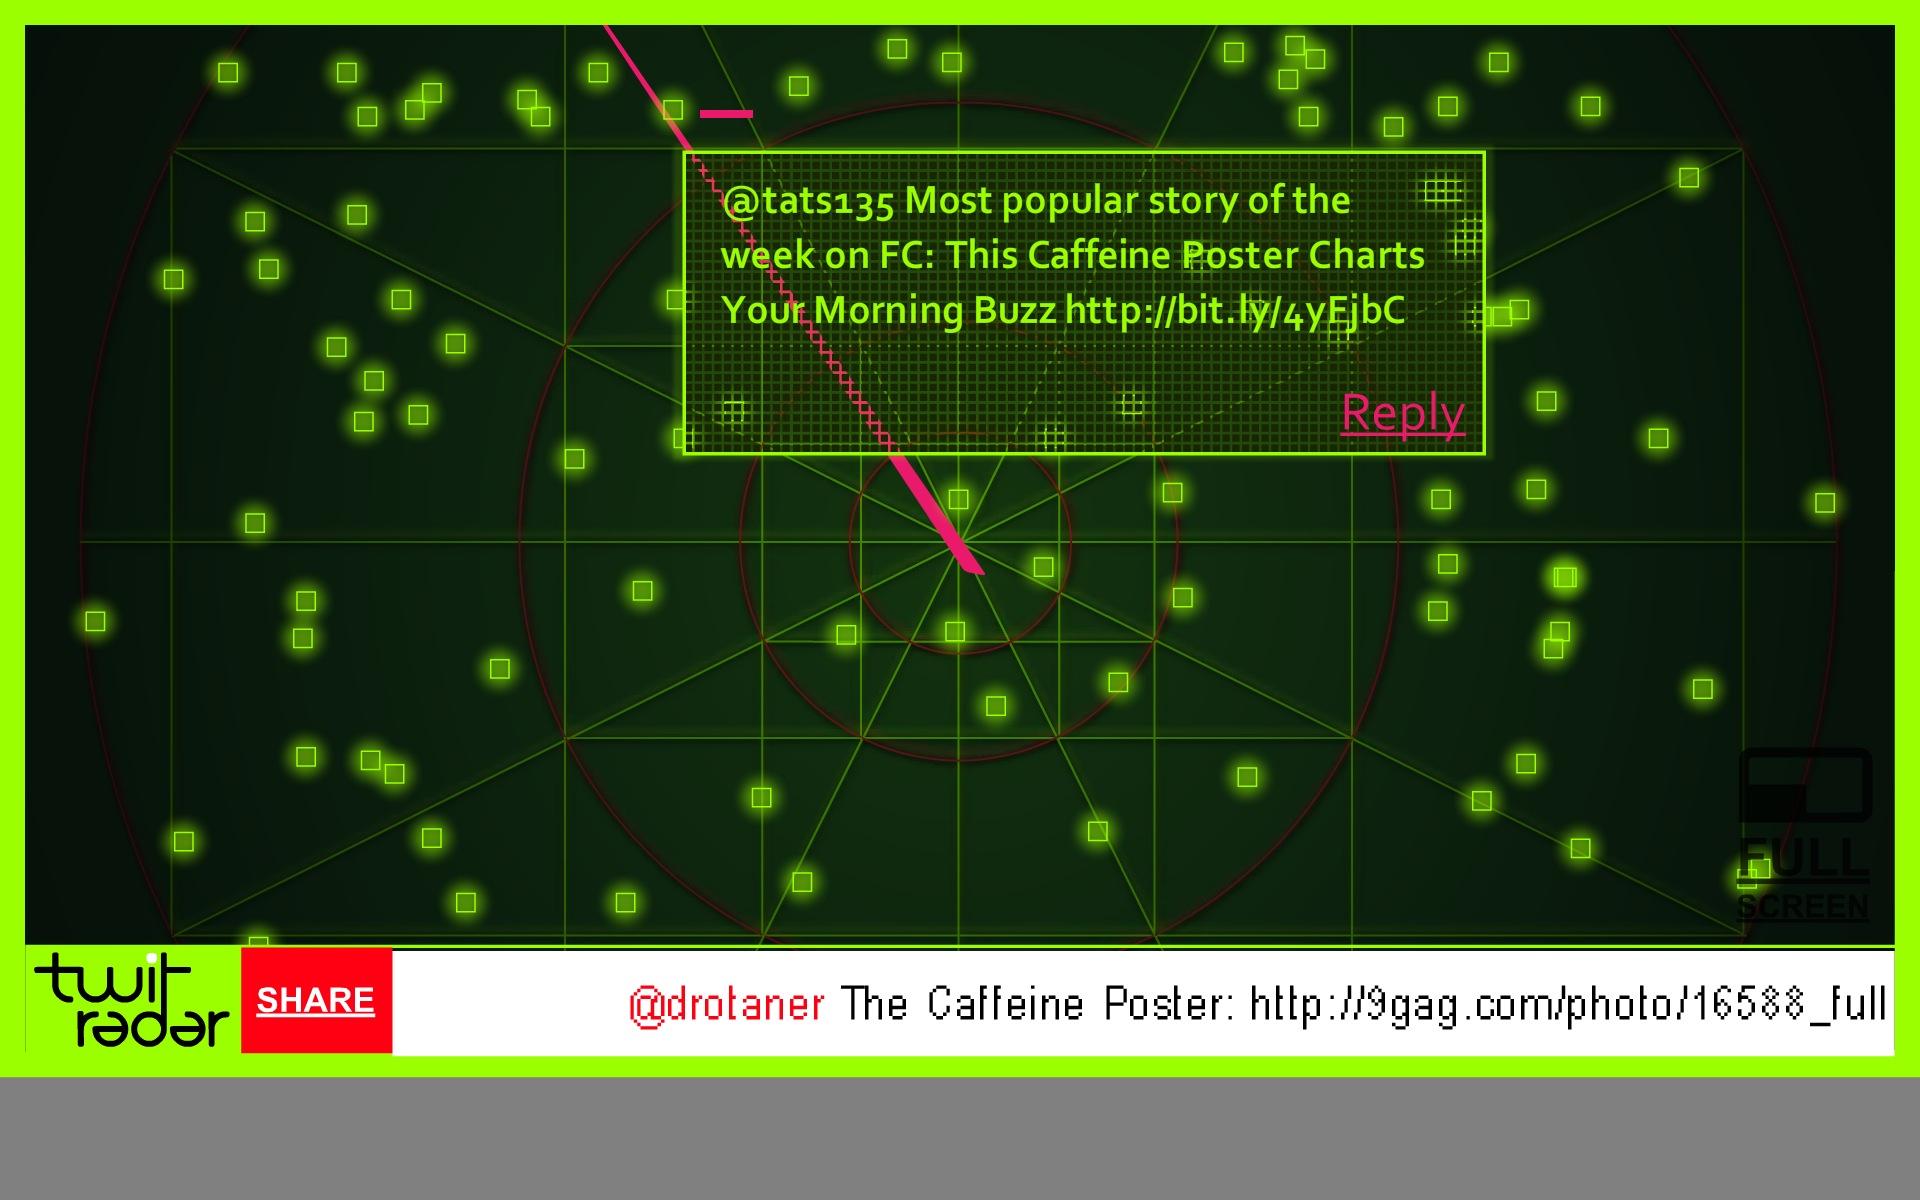 Screen+shot+2010-01-18+at+10.14.24AM+++Jan+18.jpg